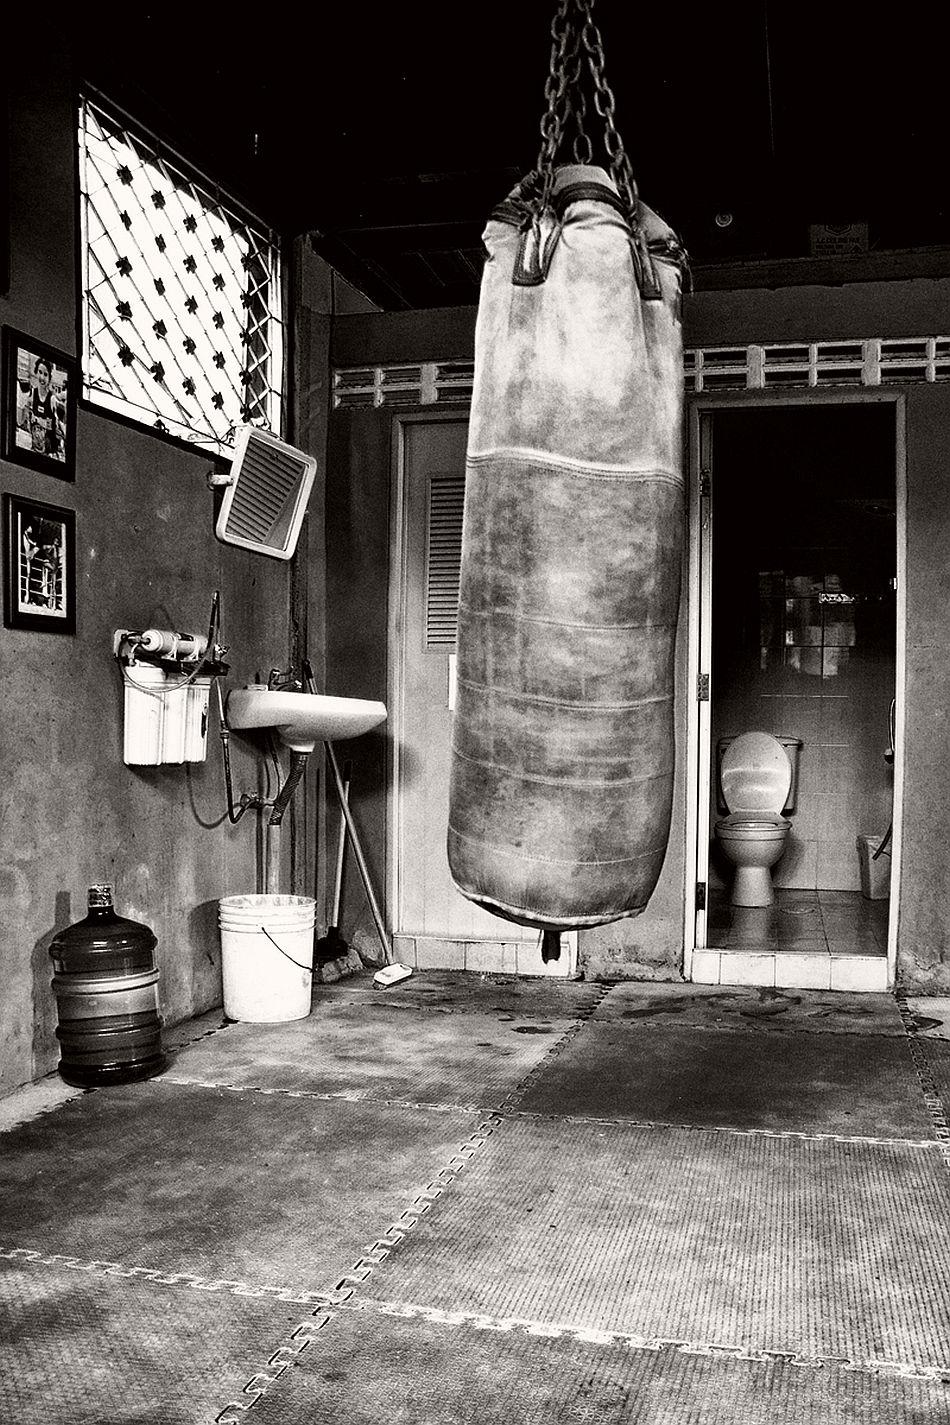 davide-palmisano-the-muay-thai-boxing-02